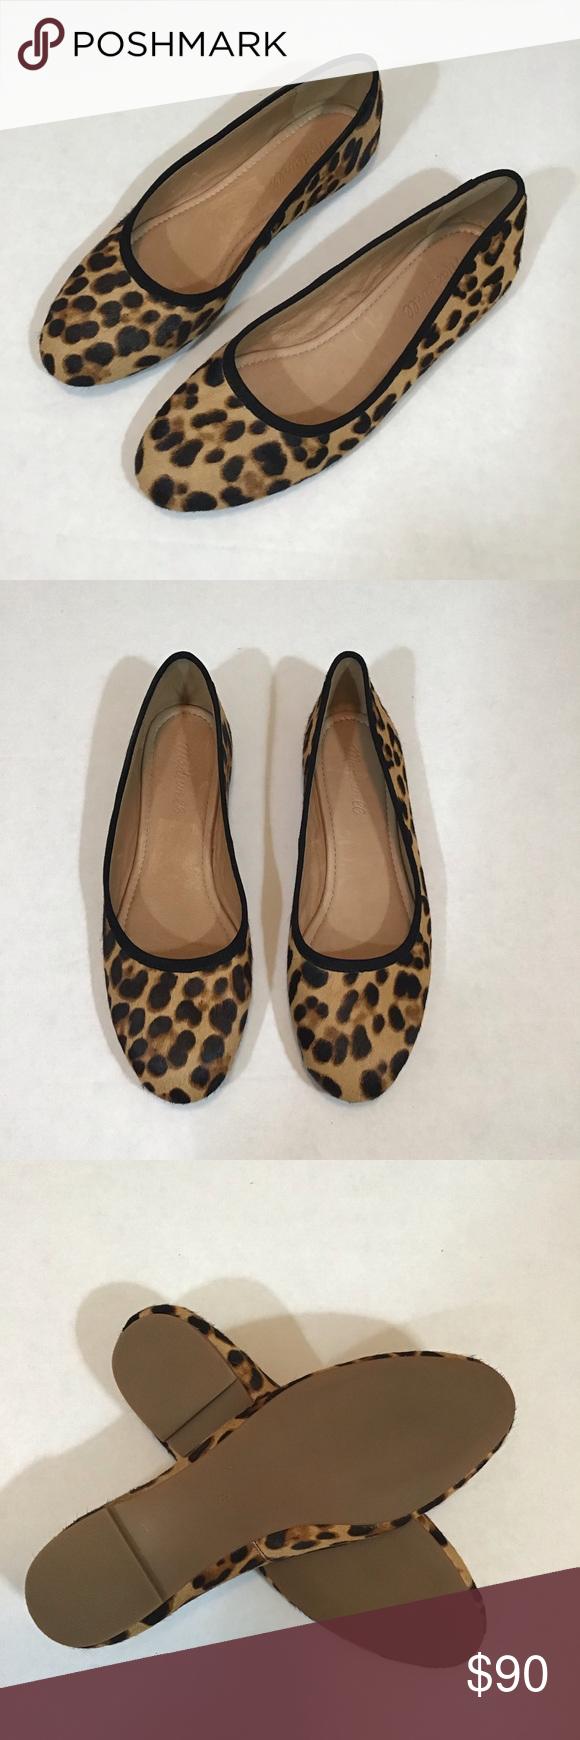 Reid Ballet Flat in Leopard Calf Hair